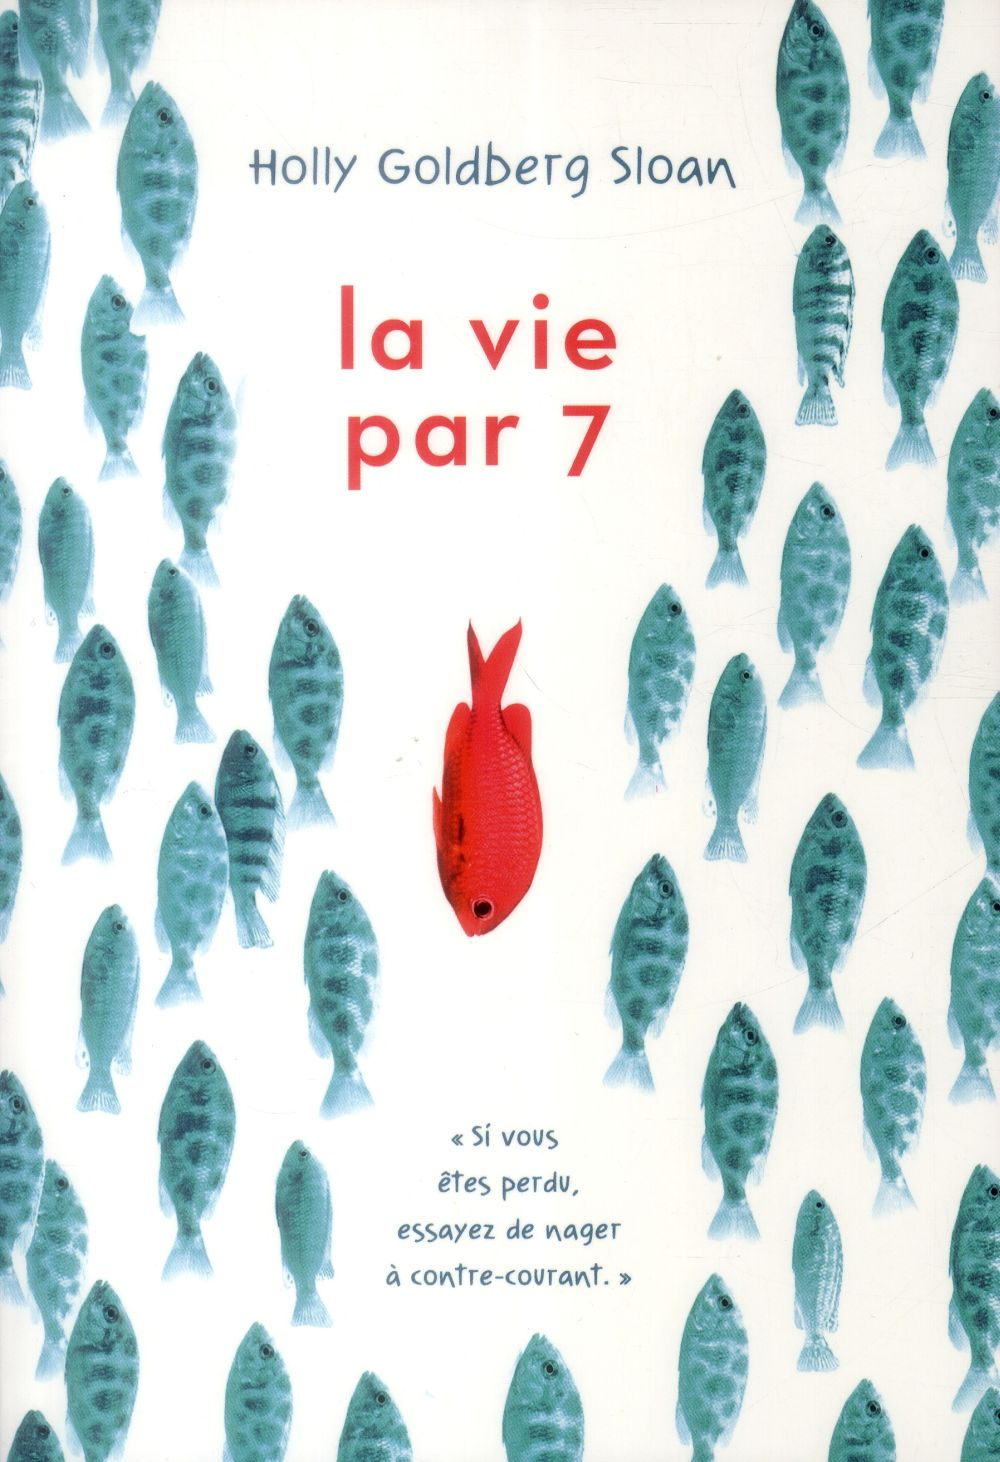 LA VIE PAR 7